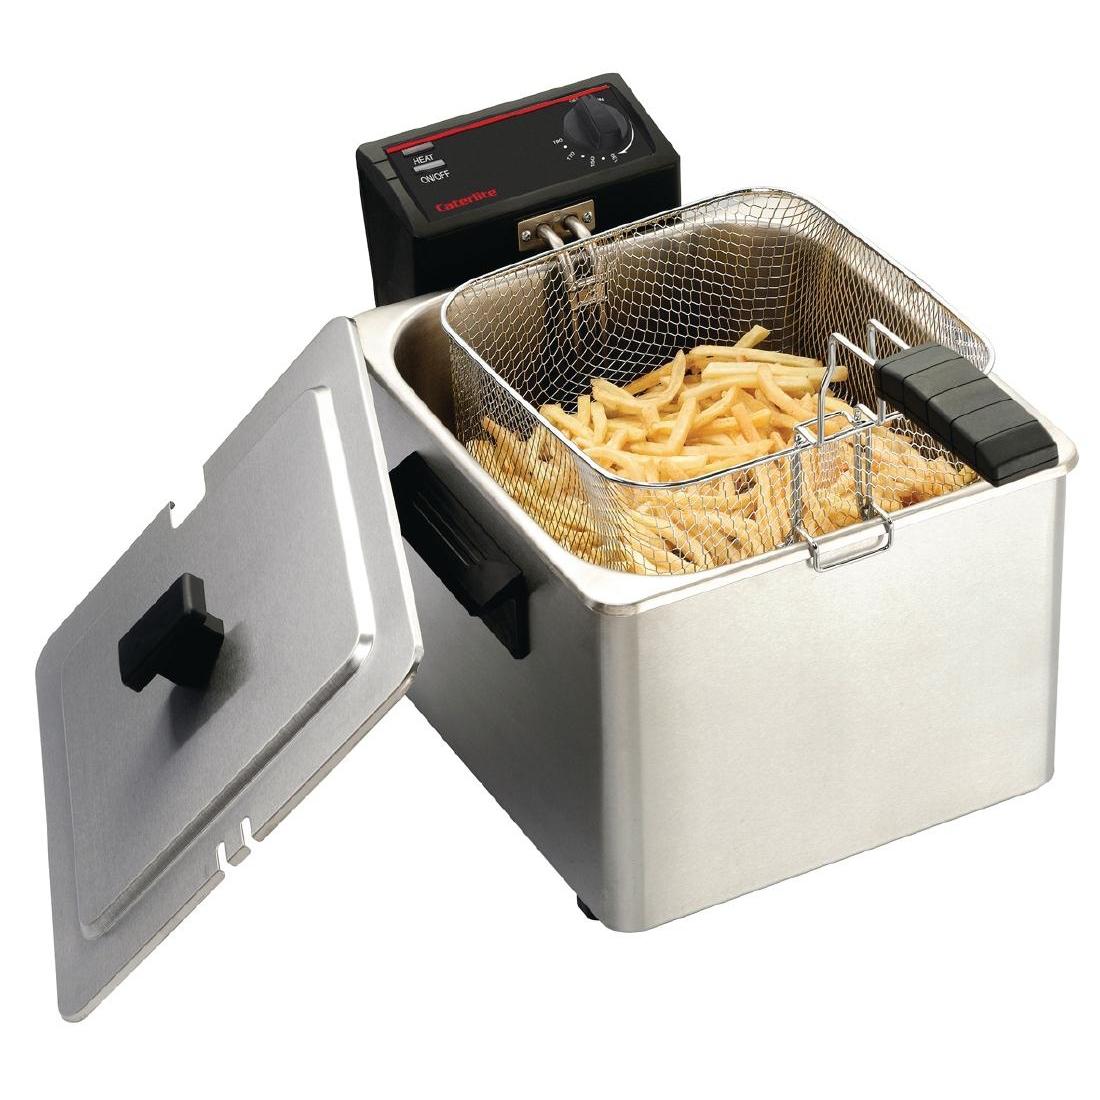 Friteuse de comptoir simple peu intensive 8L